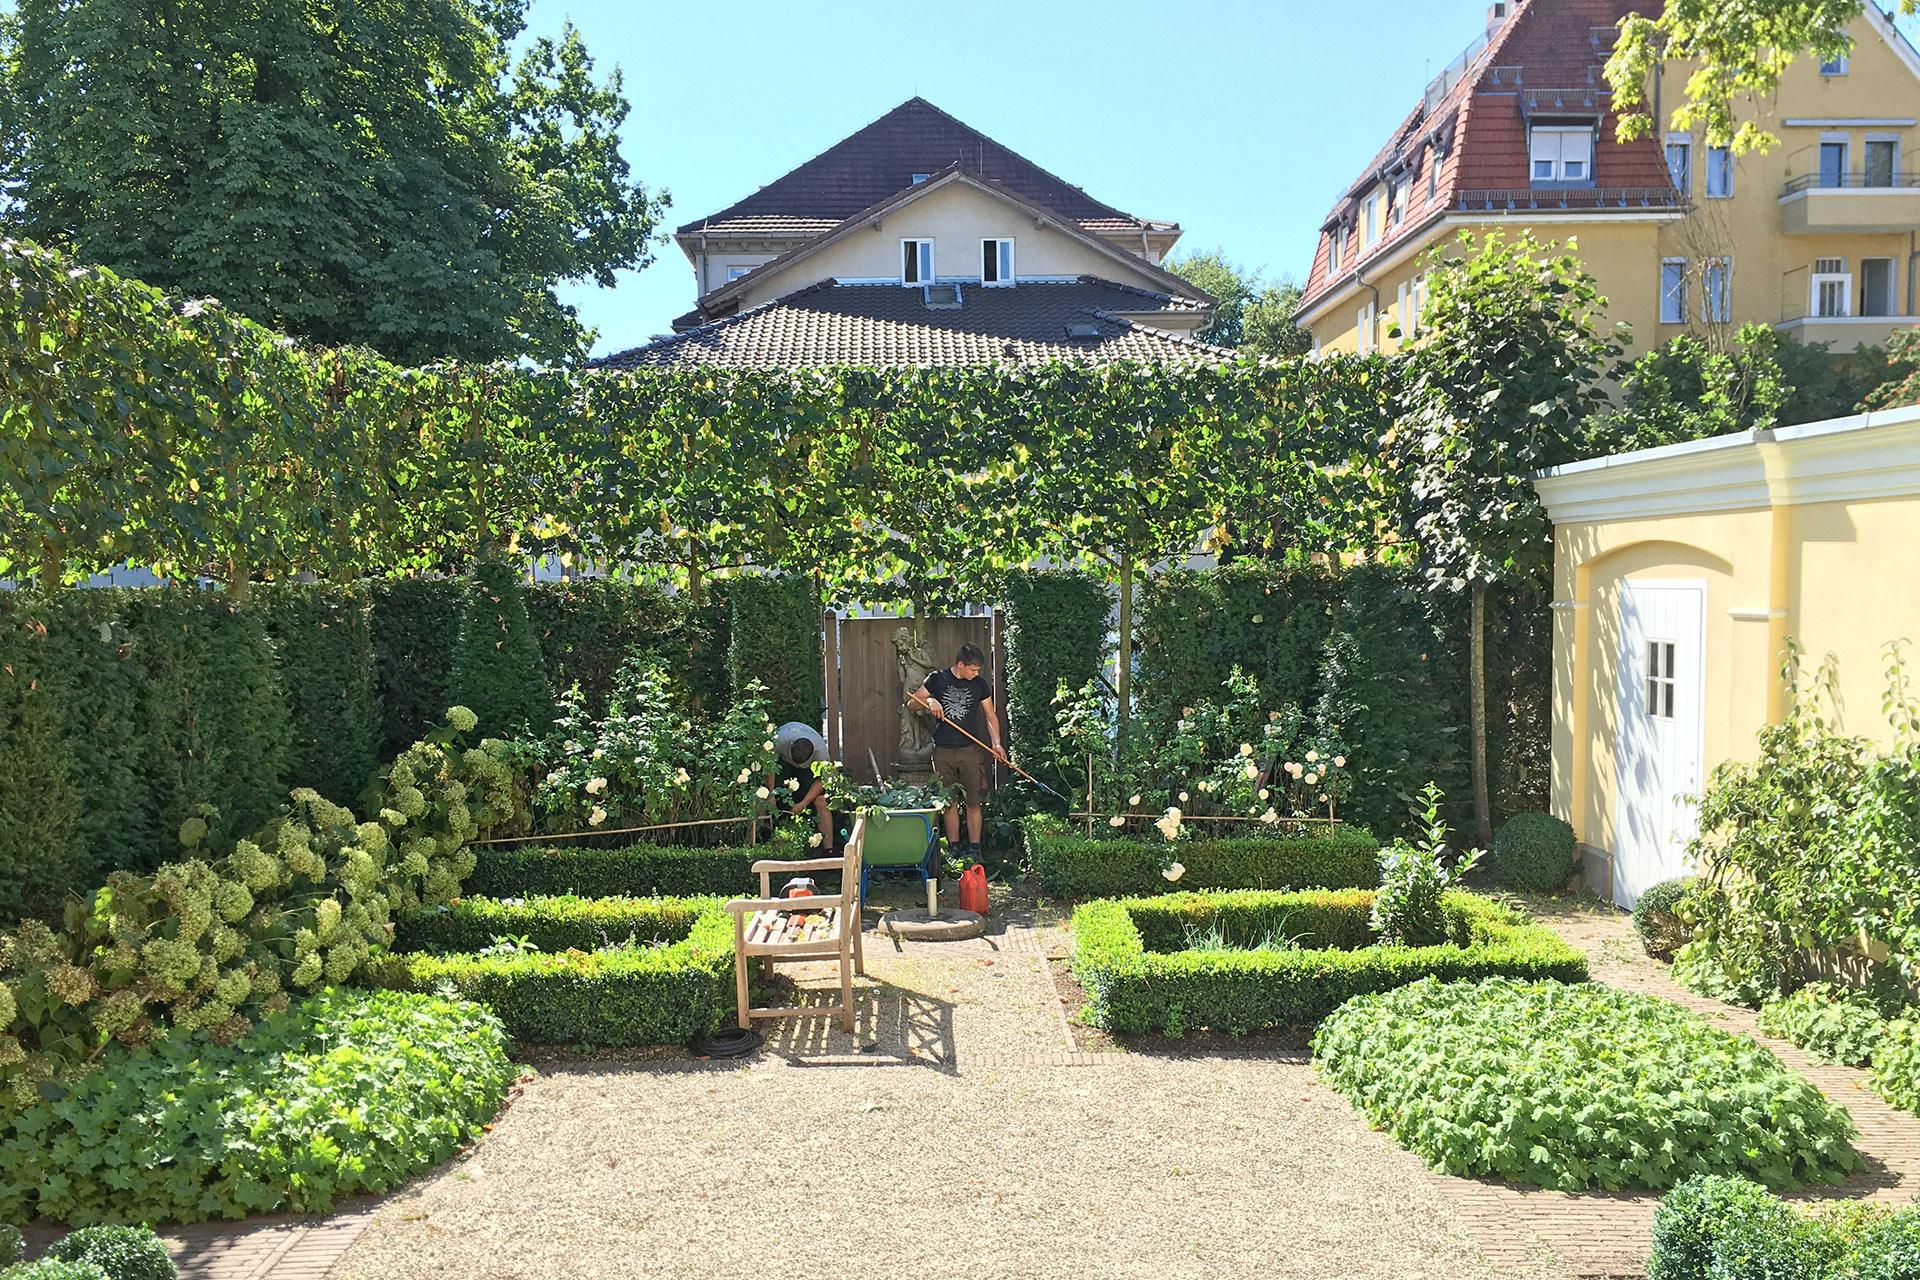 Pflege eines Stadtgartens in Coburg.